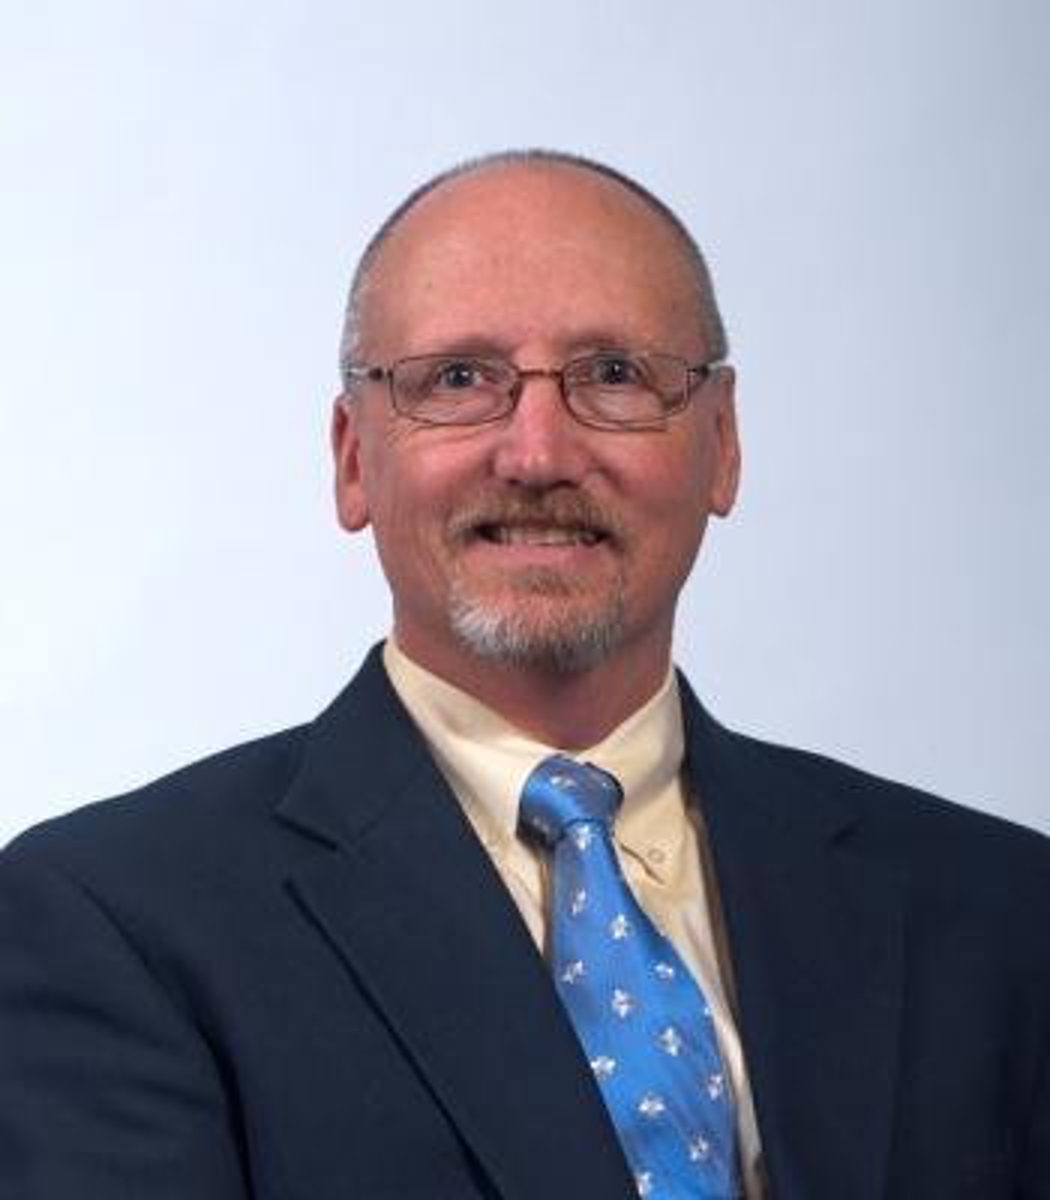 Second Chance Apartments In Atlanta: Allstate Insurance: Steve Harden Tulsa, OK